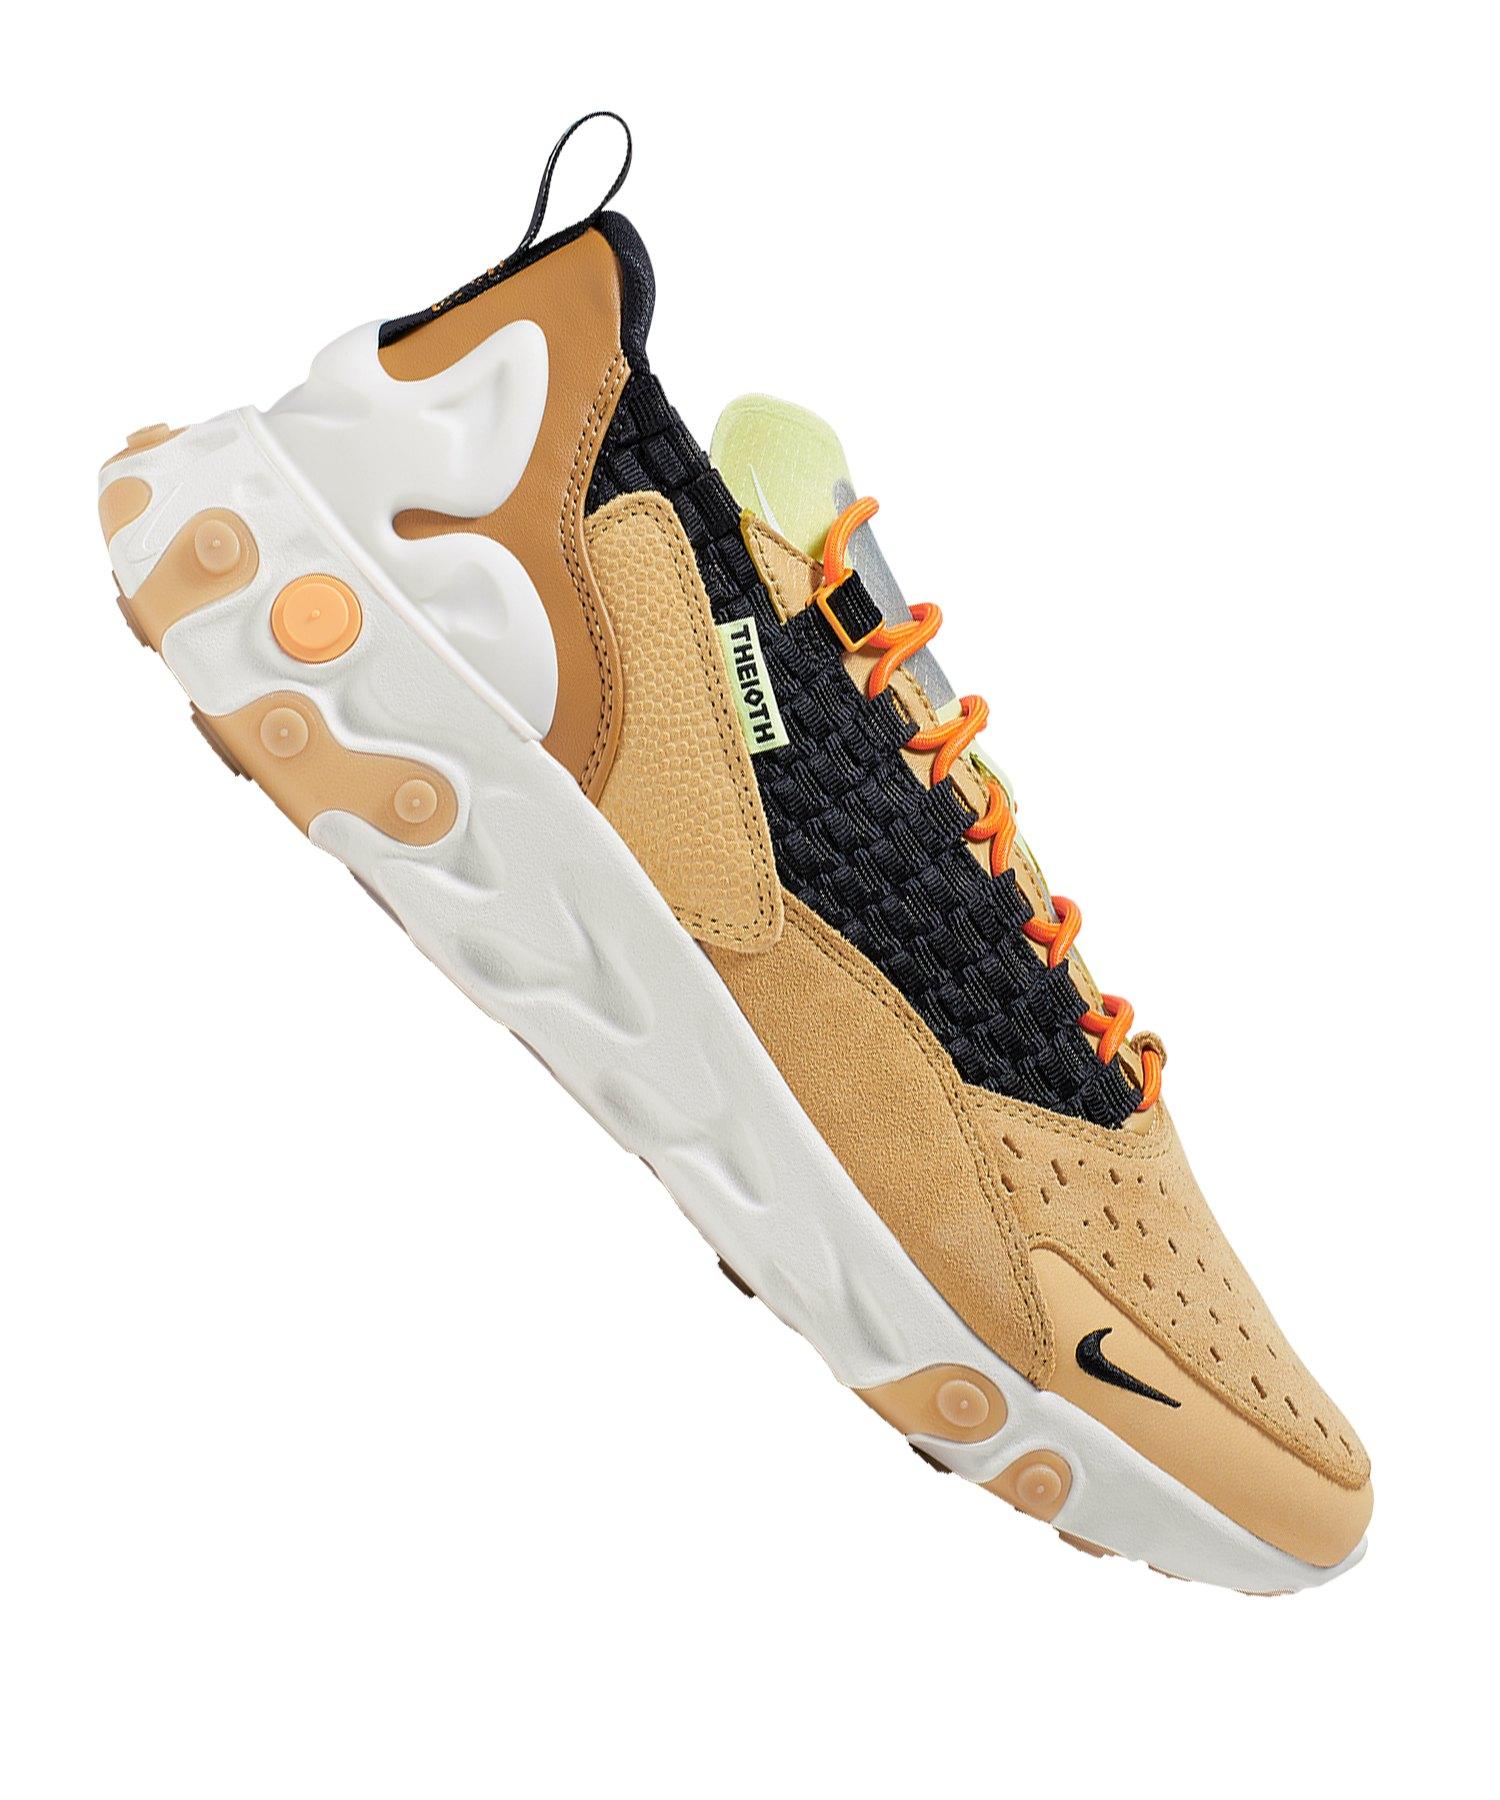 React Sertu Sneaker Nike Gelb F700 FcJl3KT1